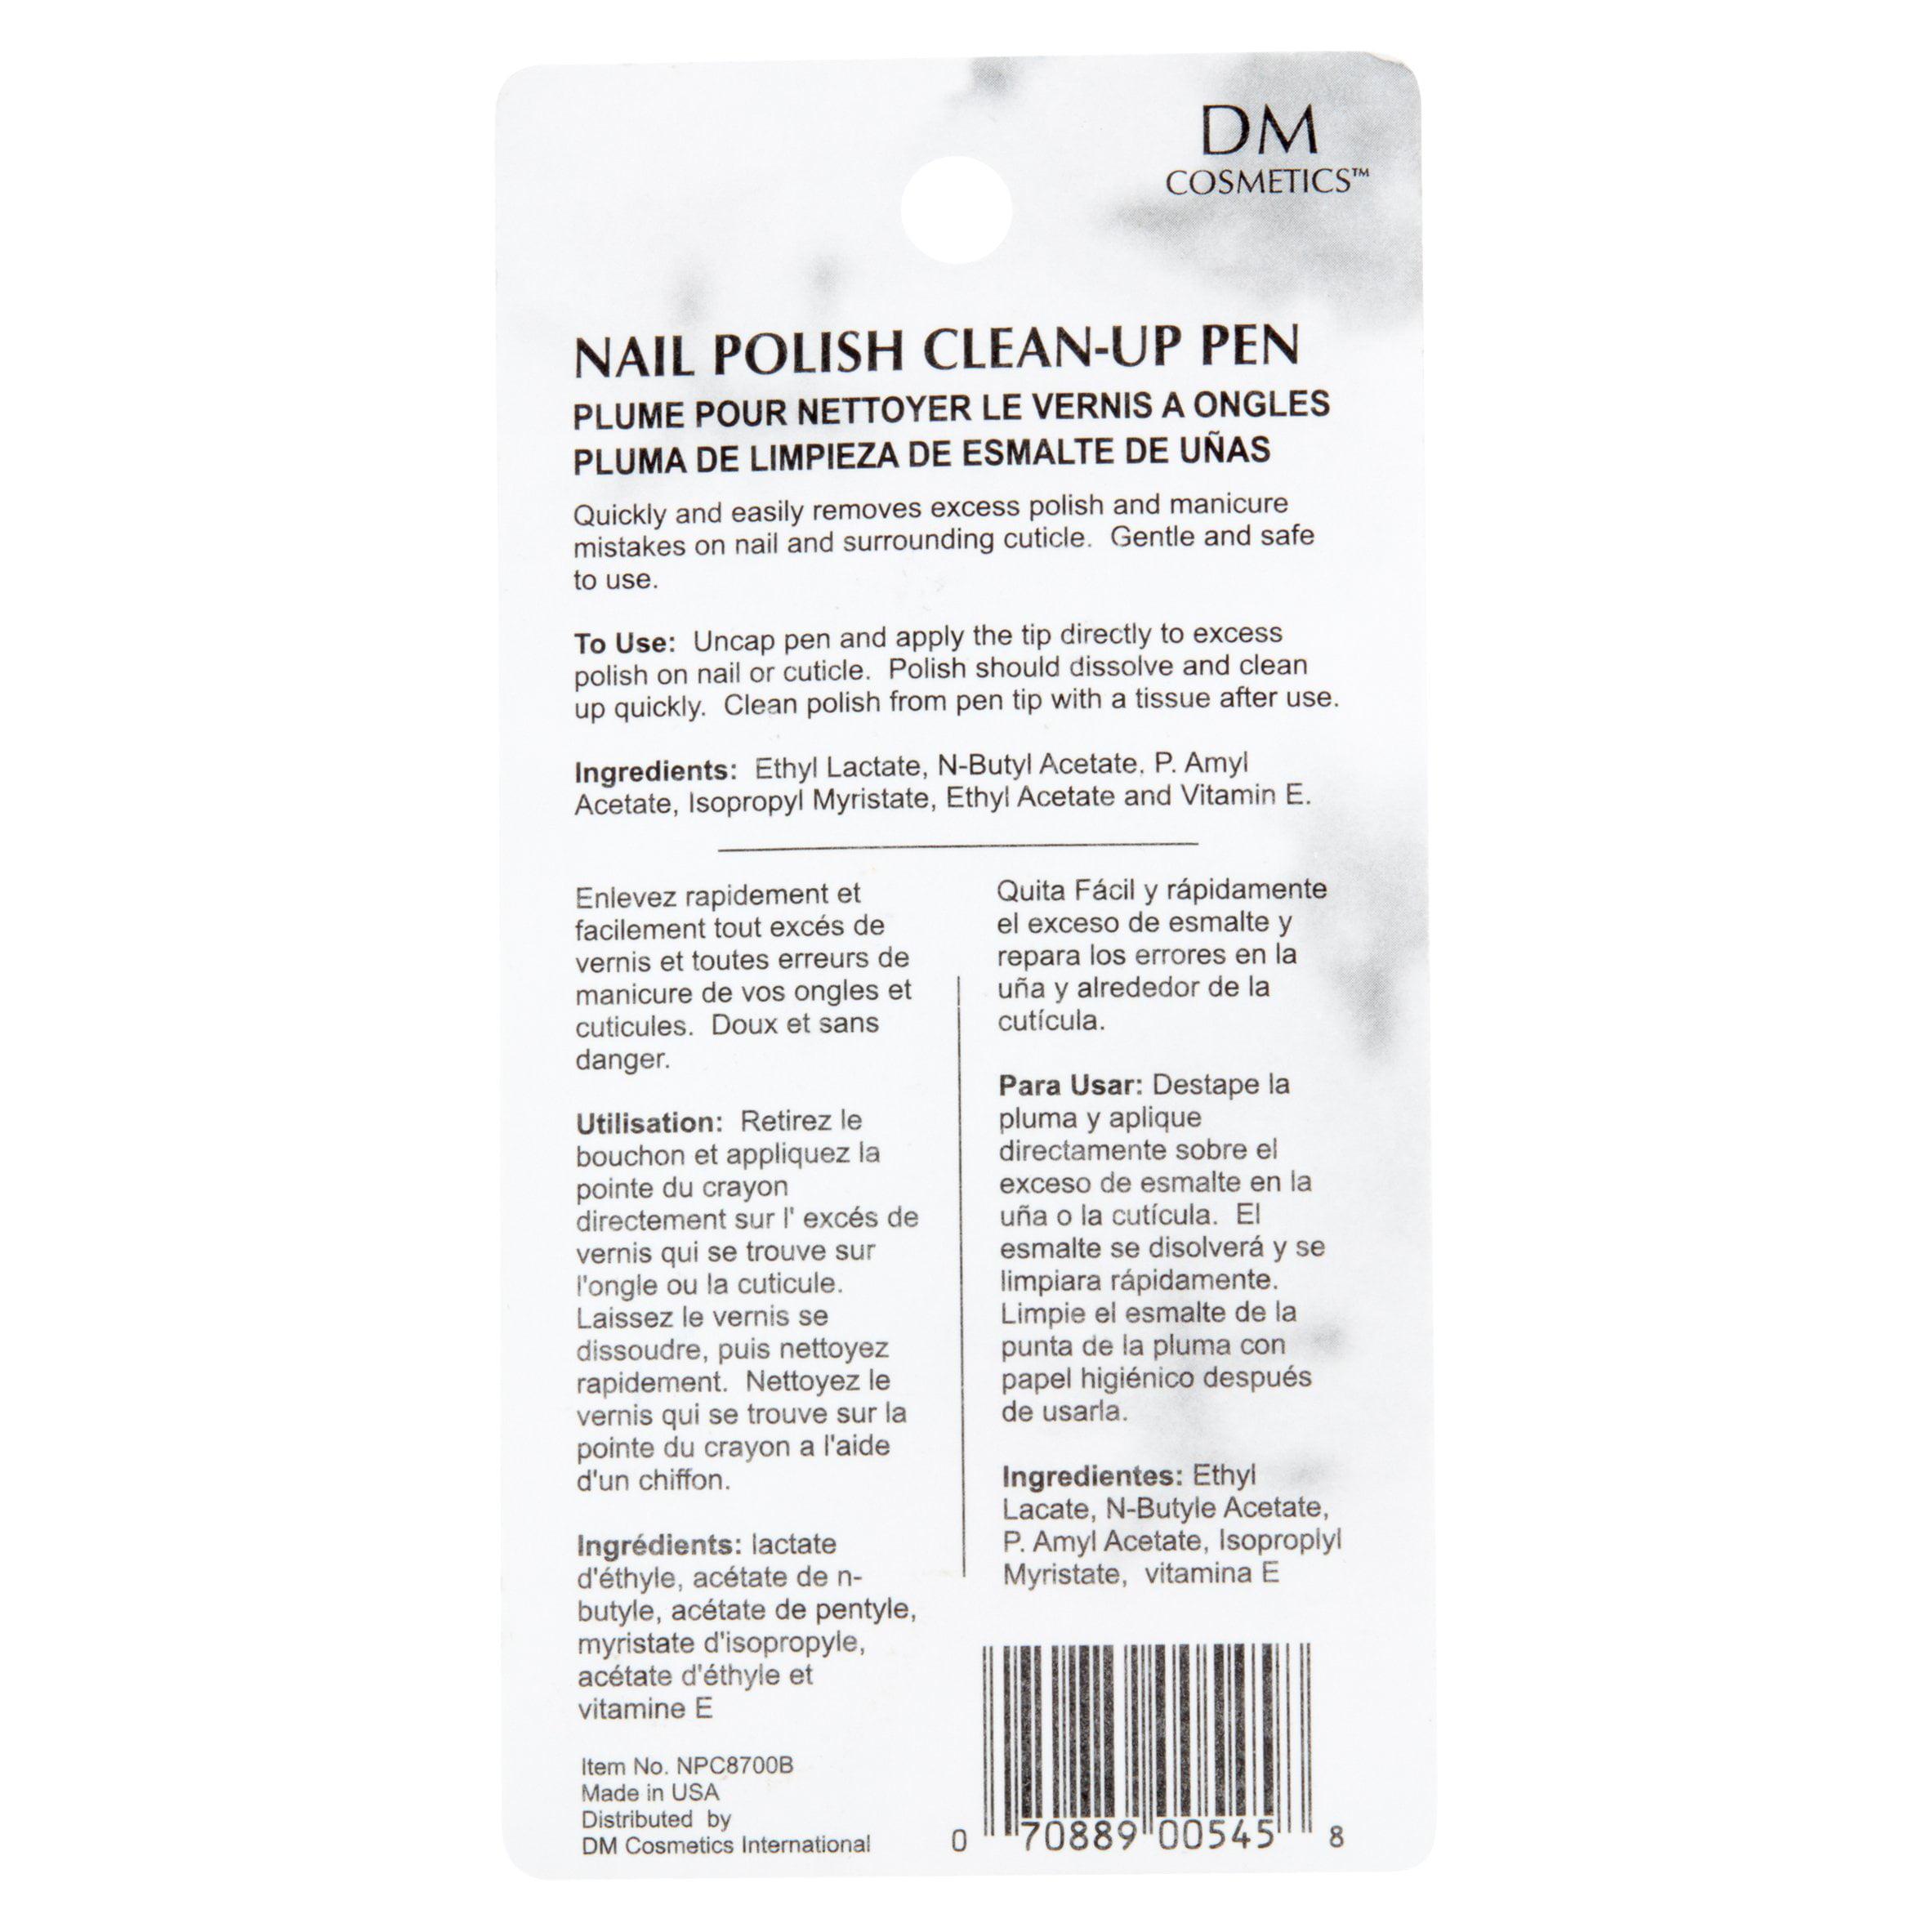 Dri Mark Nail Polish Remover And Touch Up Pen - Walmart.com